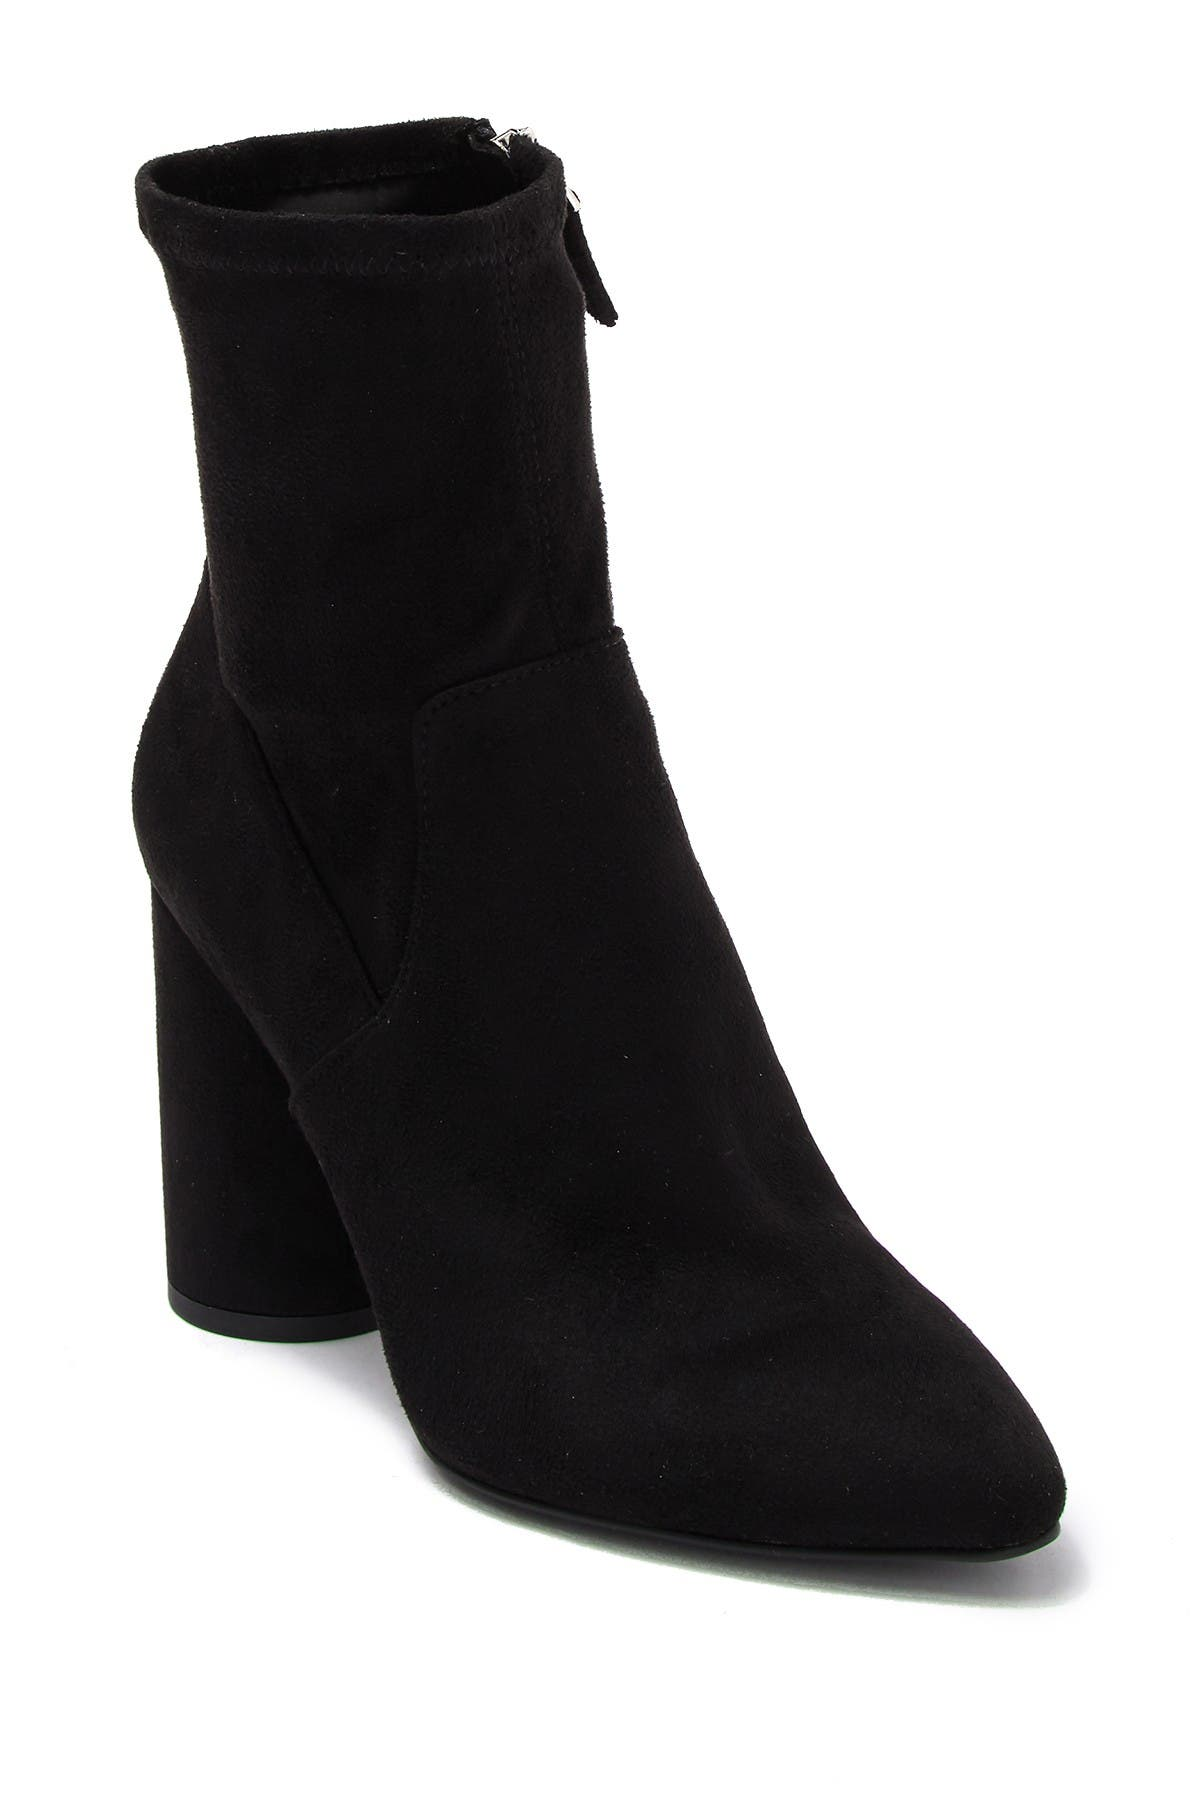 Abound | Jace Dress Sock Bootie